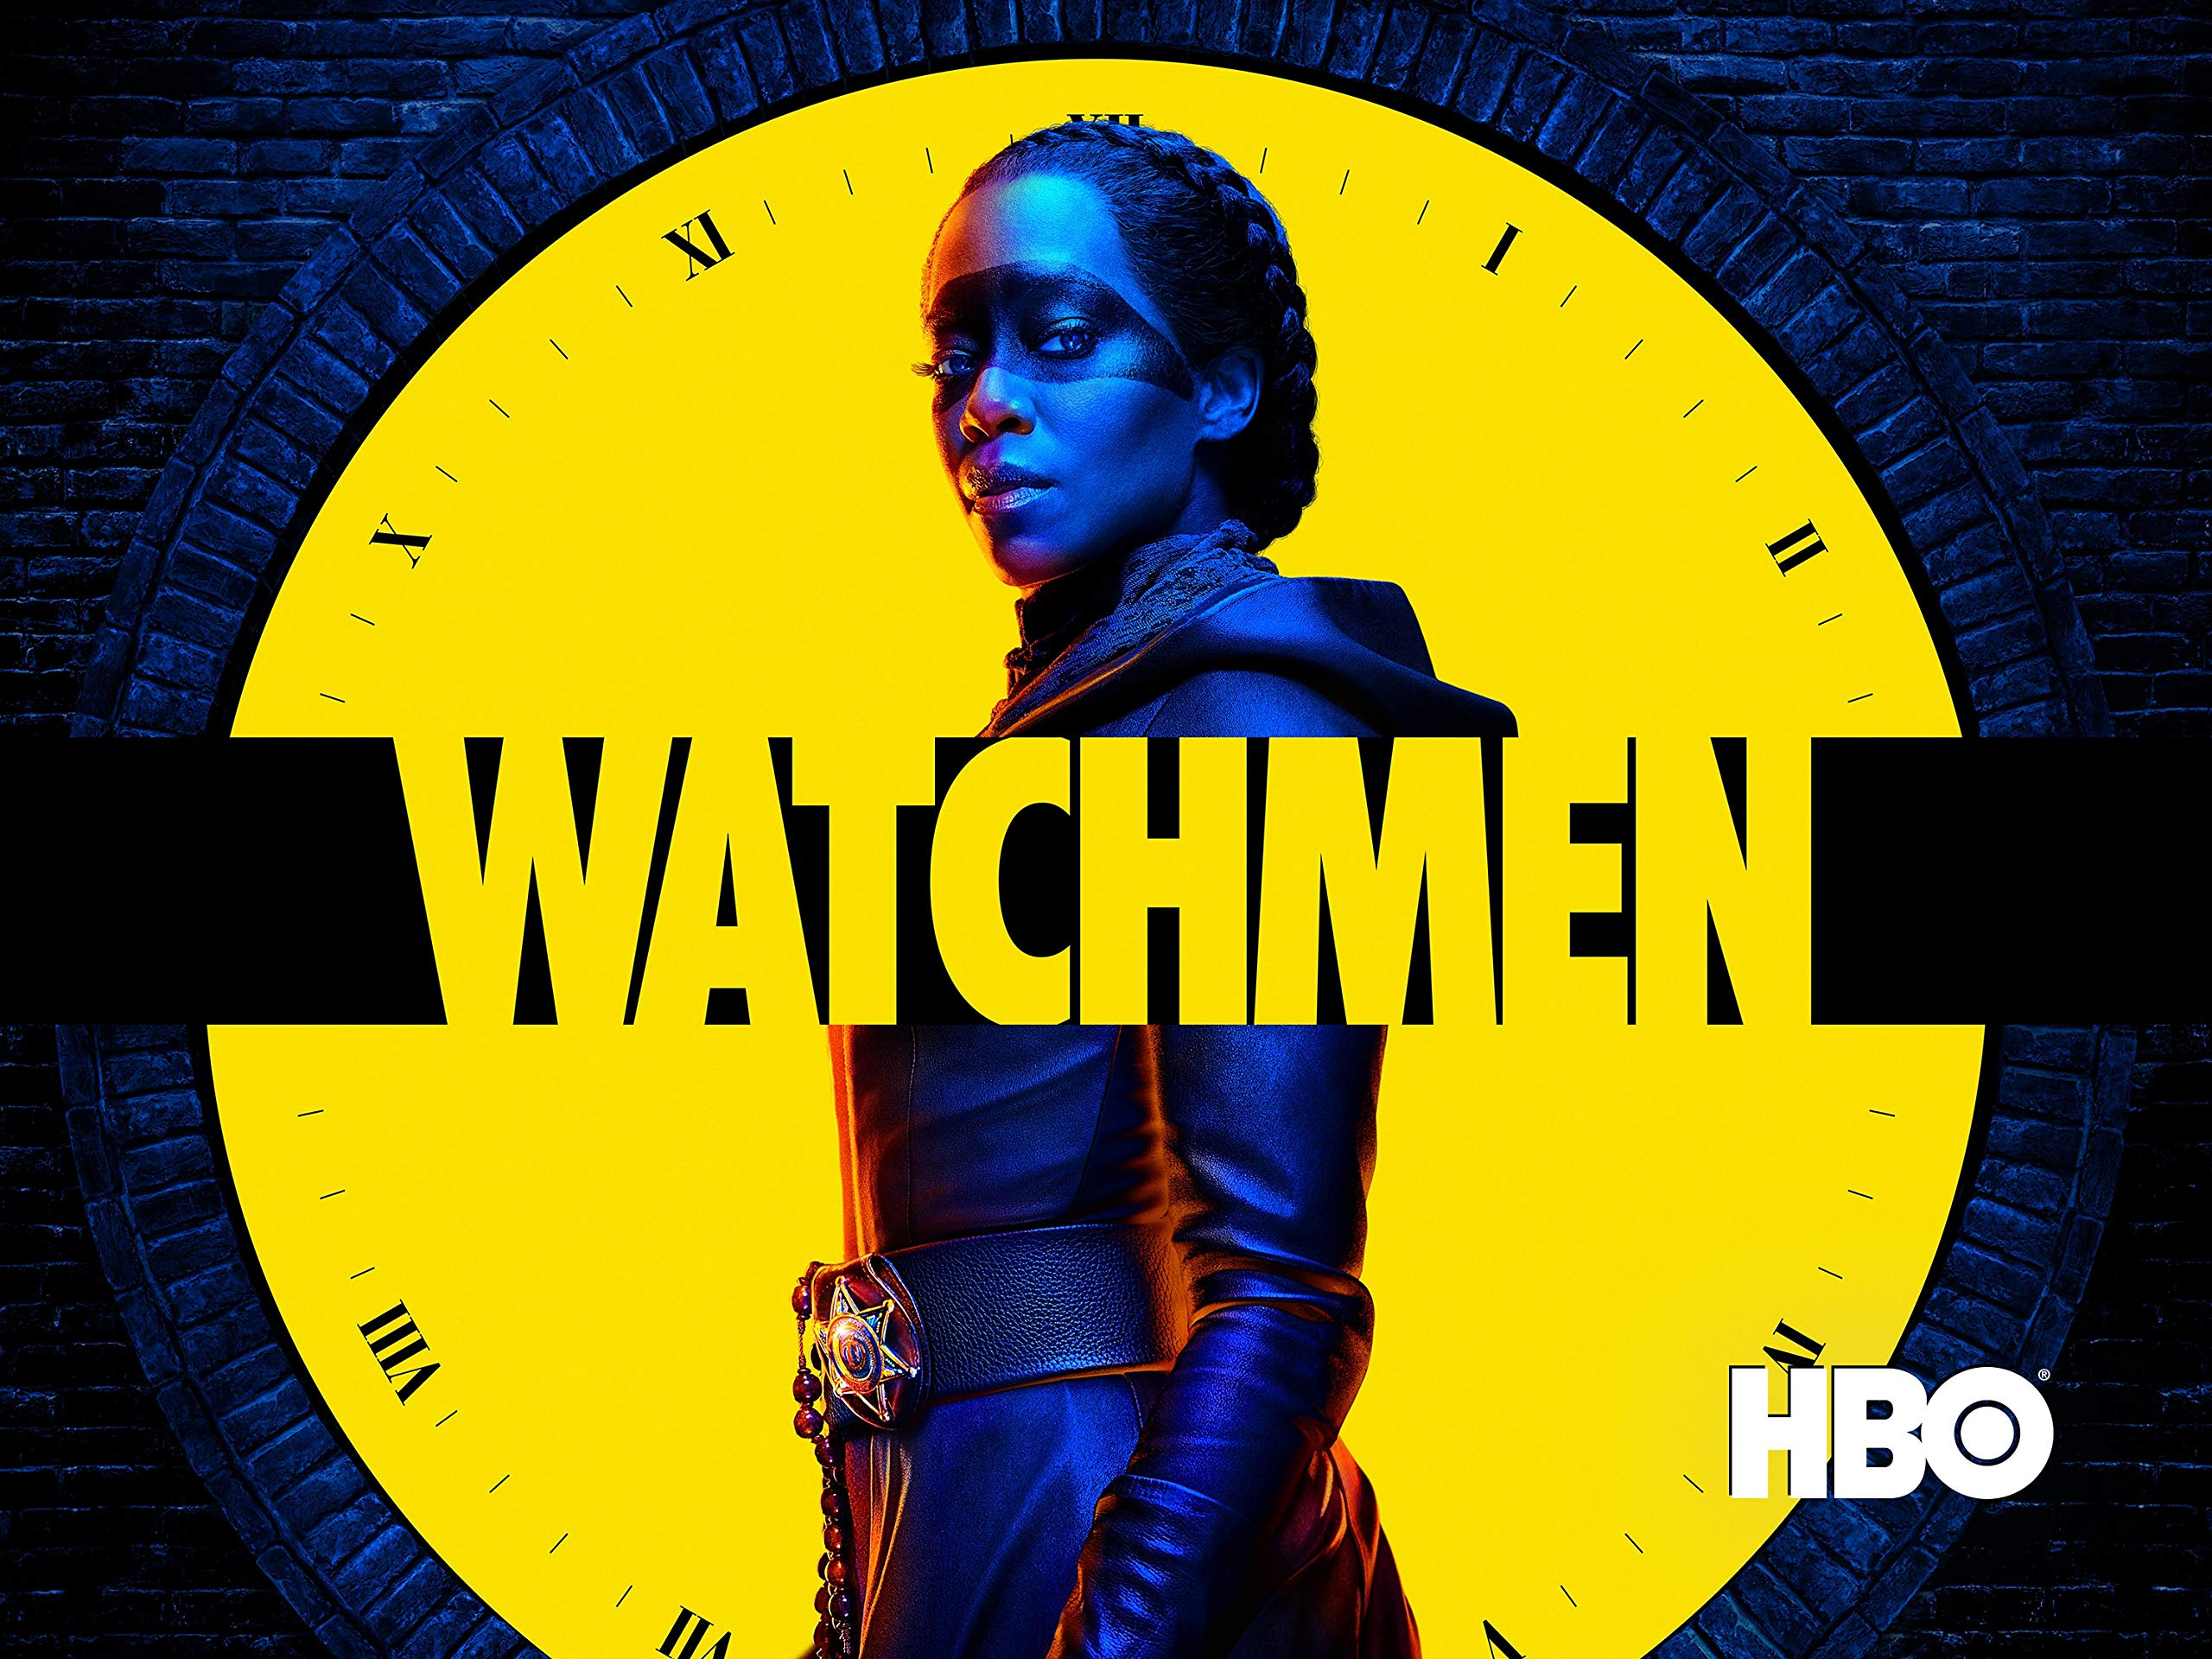 Watchmen Promo